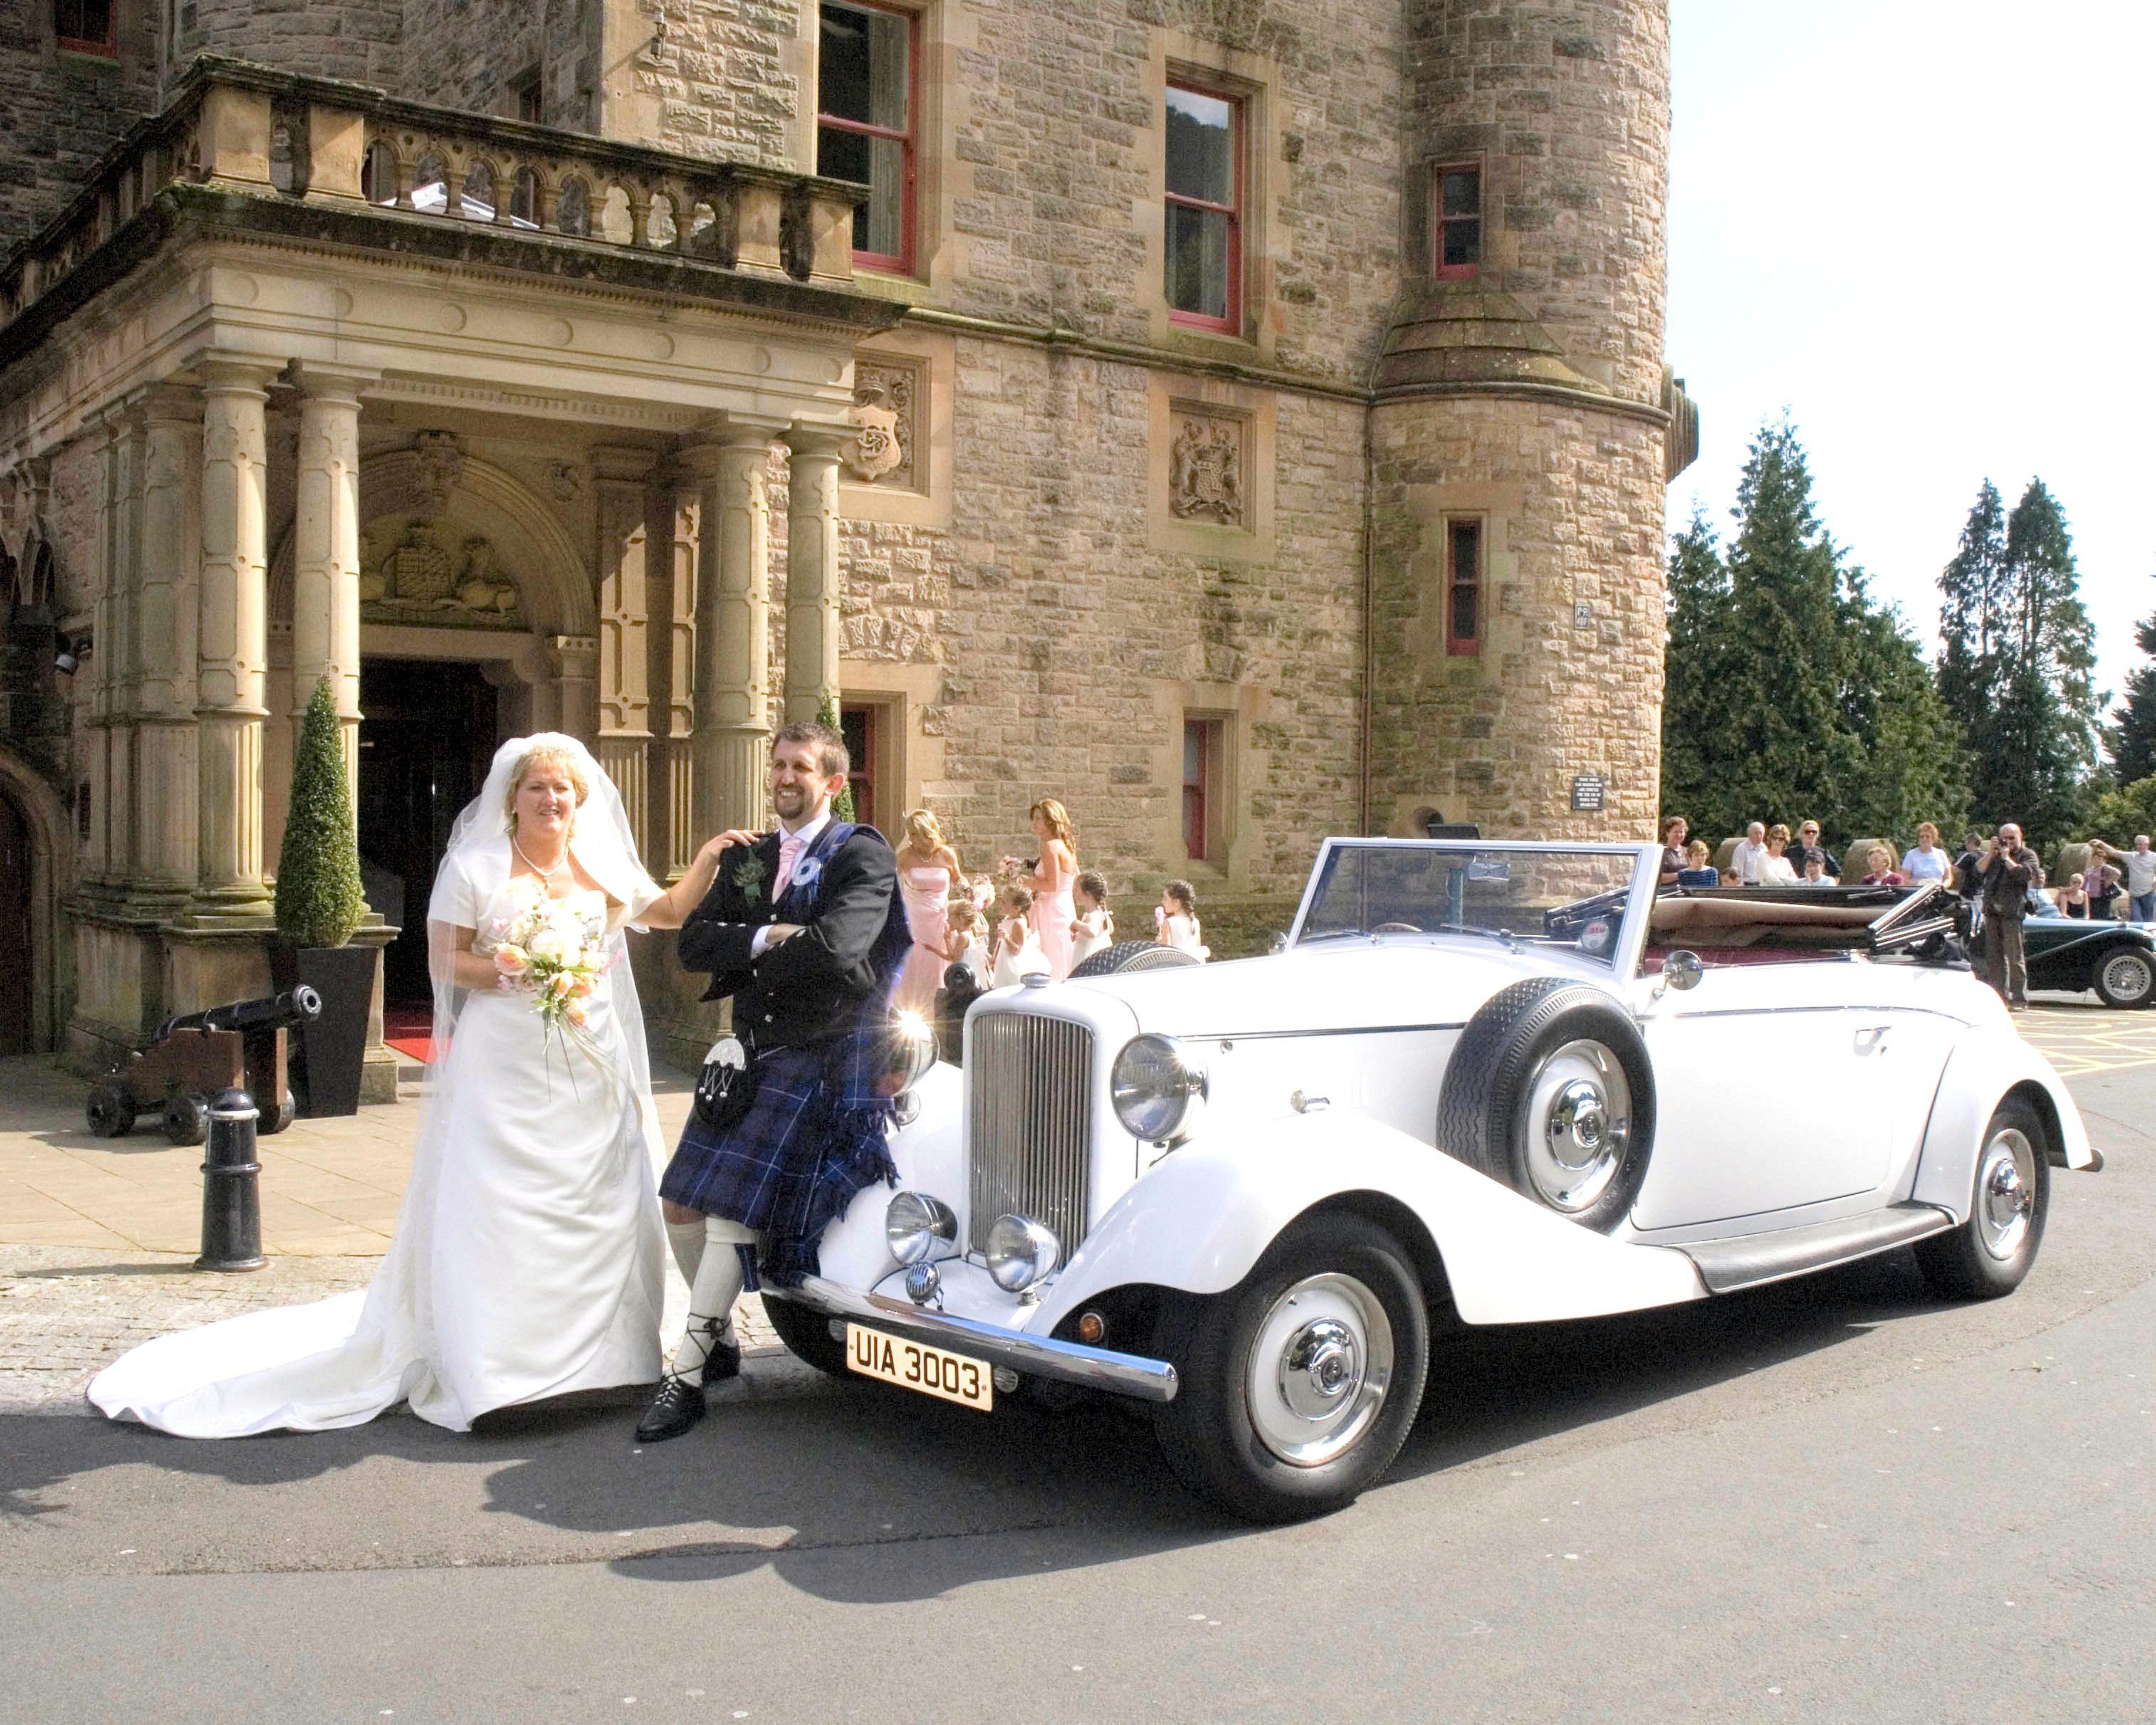 David Andrews Wedding Cars Belfast White Royale At Belfast Castle Www Davidandrewsweddingcars Com Wedding Car Belfast Castle Castle